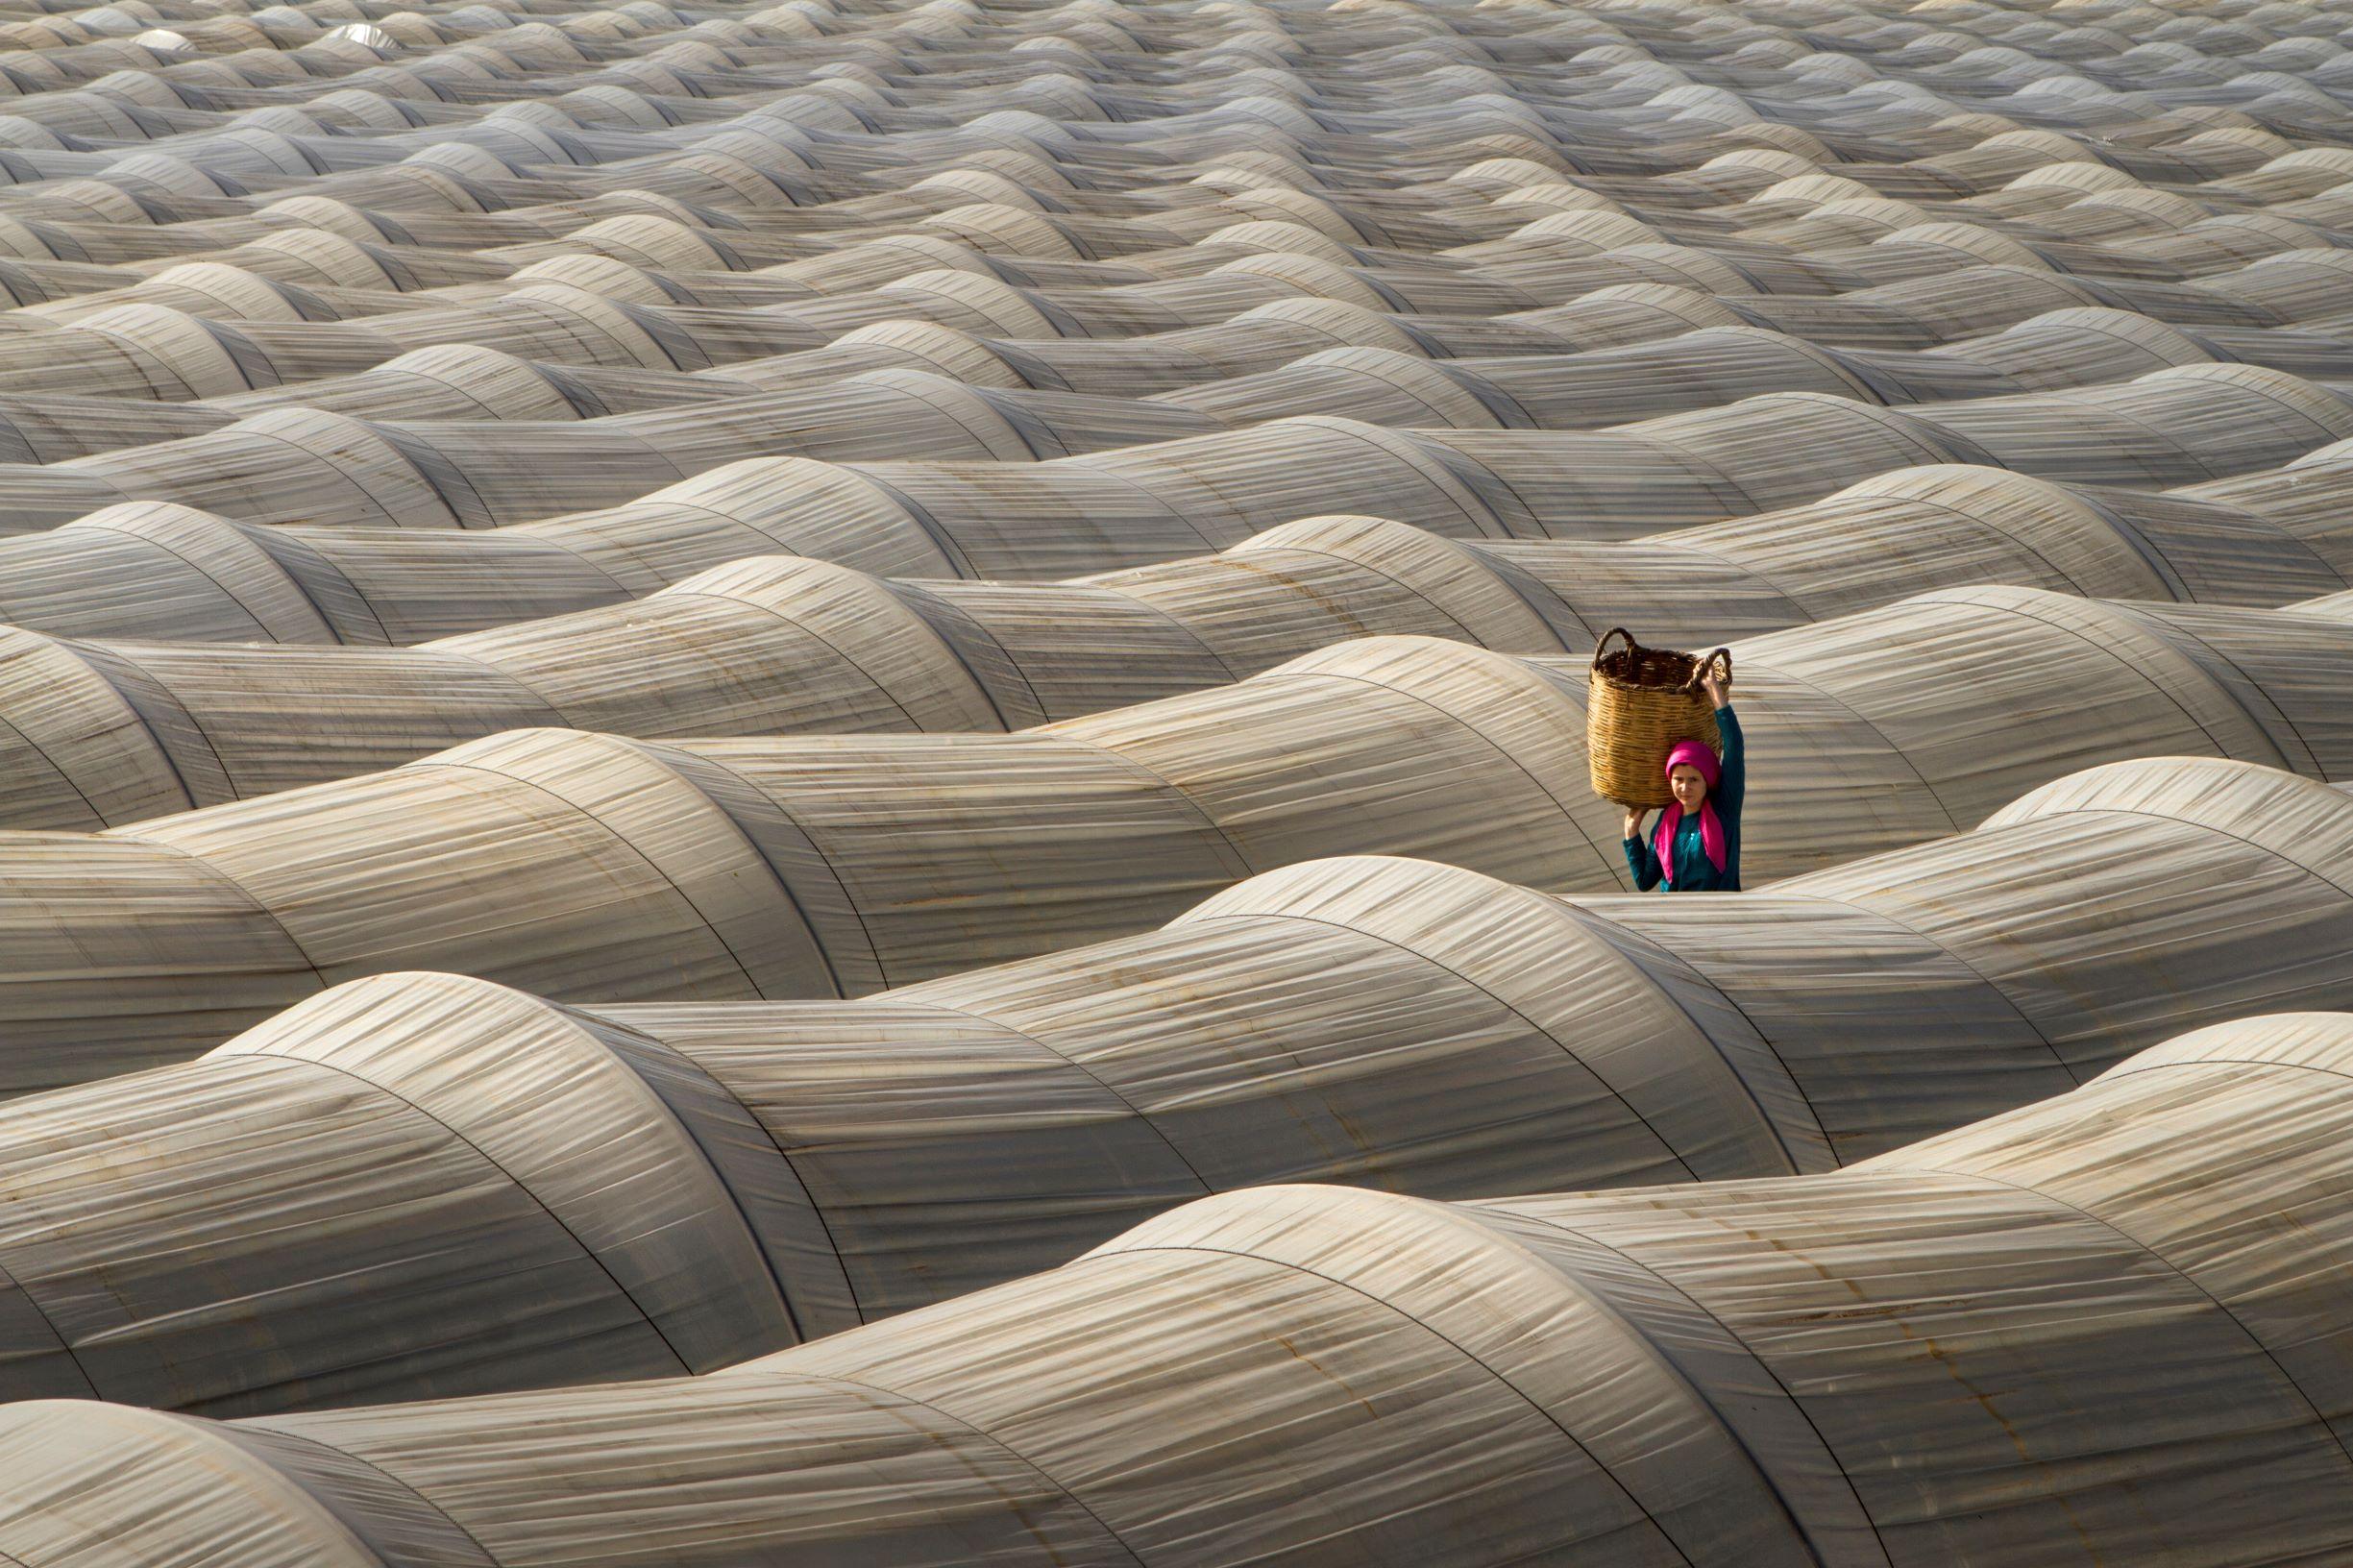 © CEWE/ Leyla Emektar, Turkey